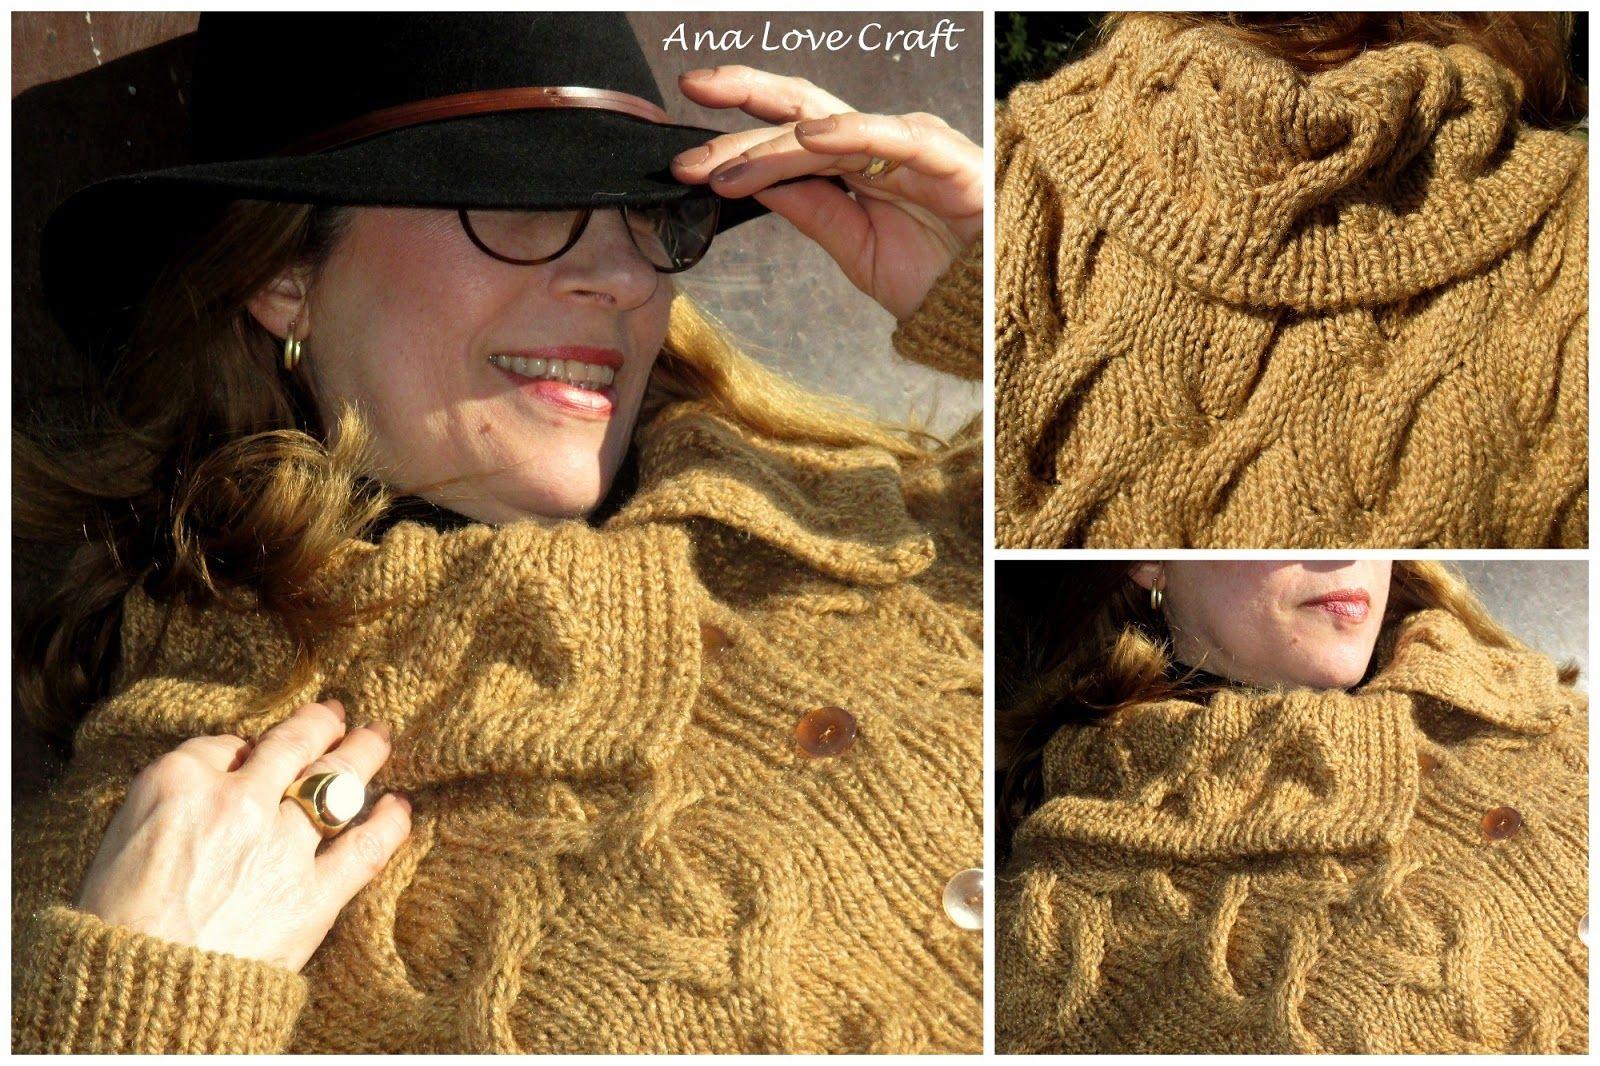 Ana Love Craft: CASACO, GOLA E O MEU GATO - WOOL COAT, SCARVE AND MY CAT